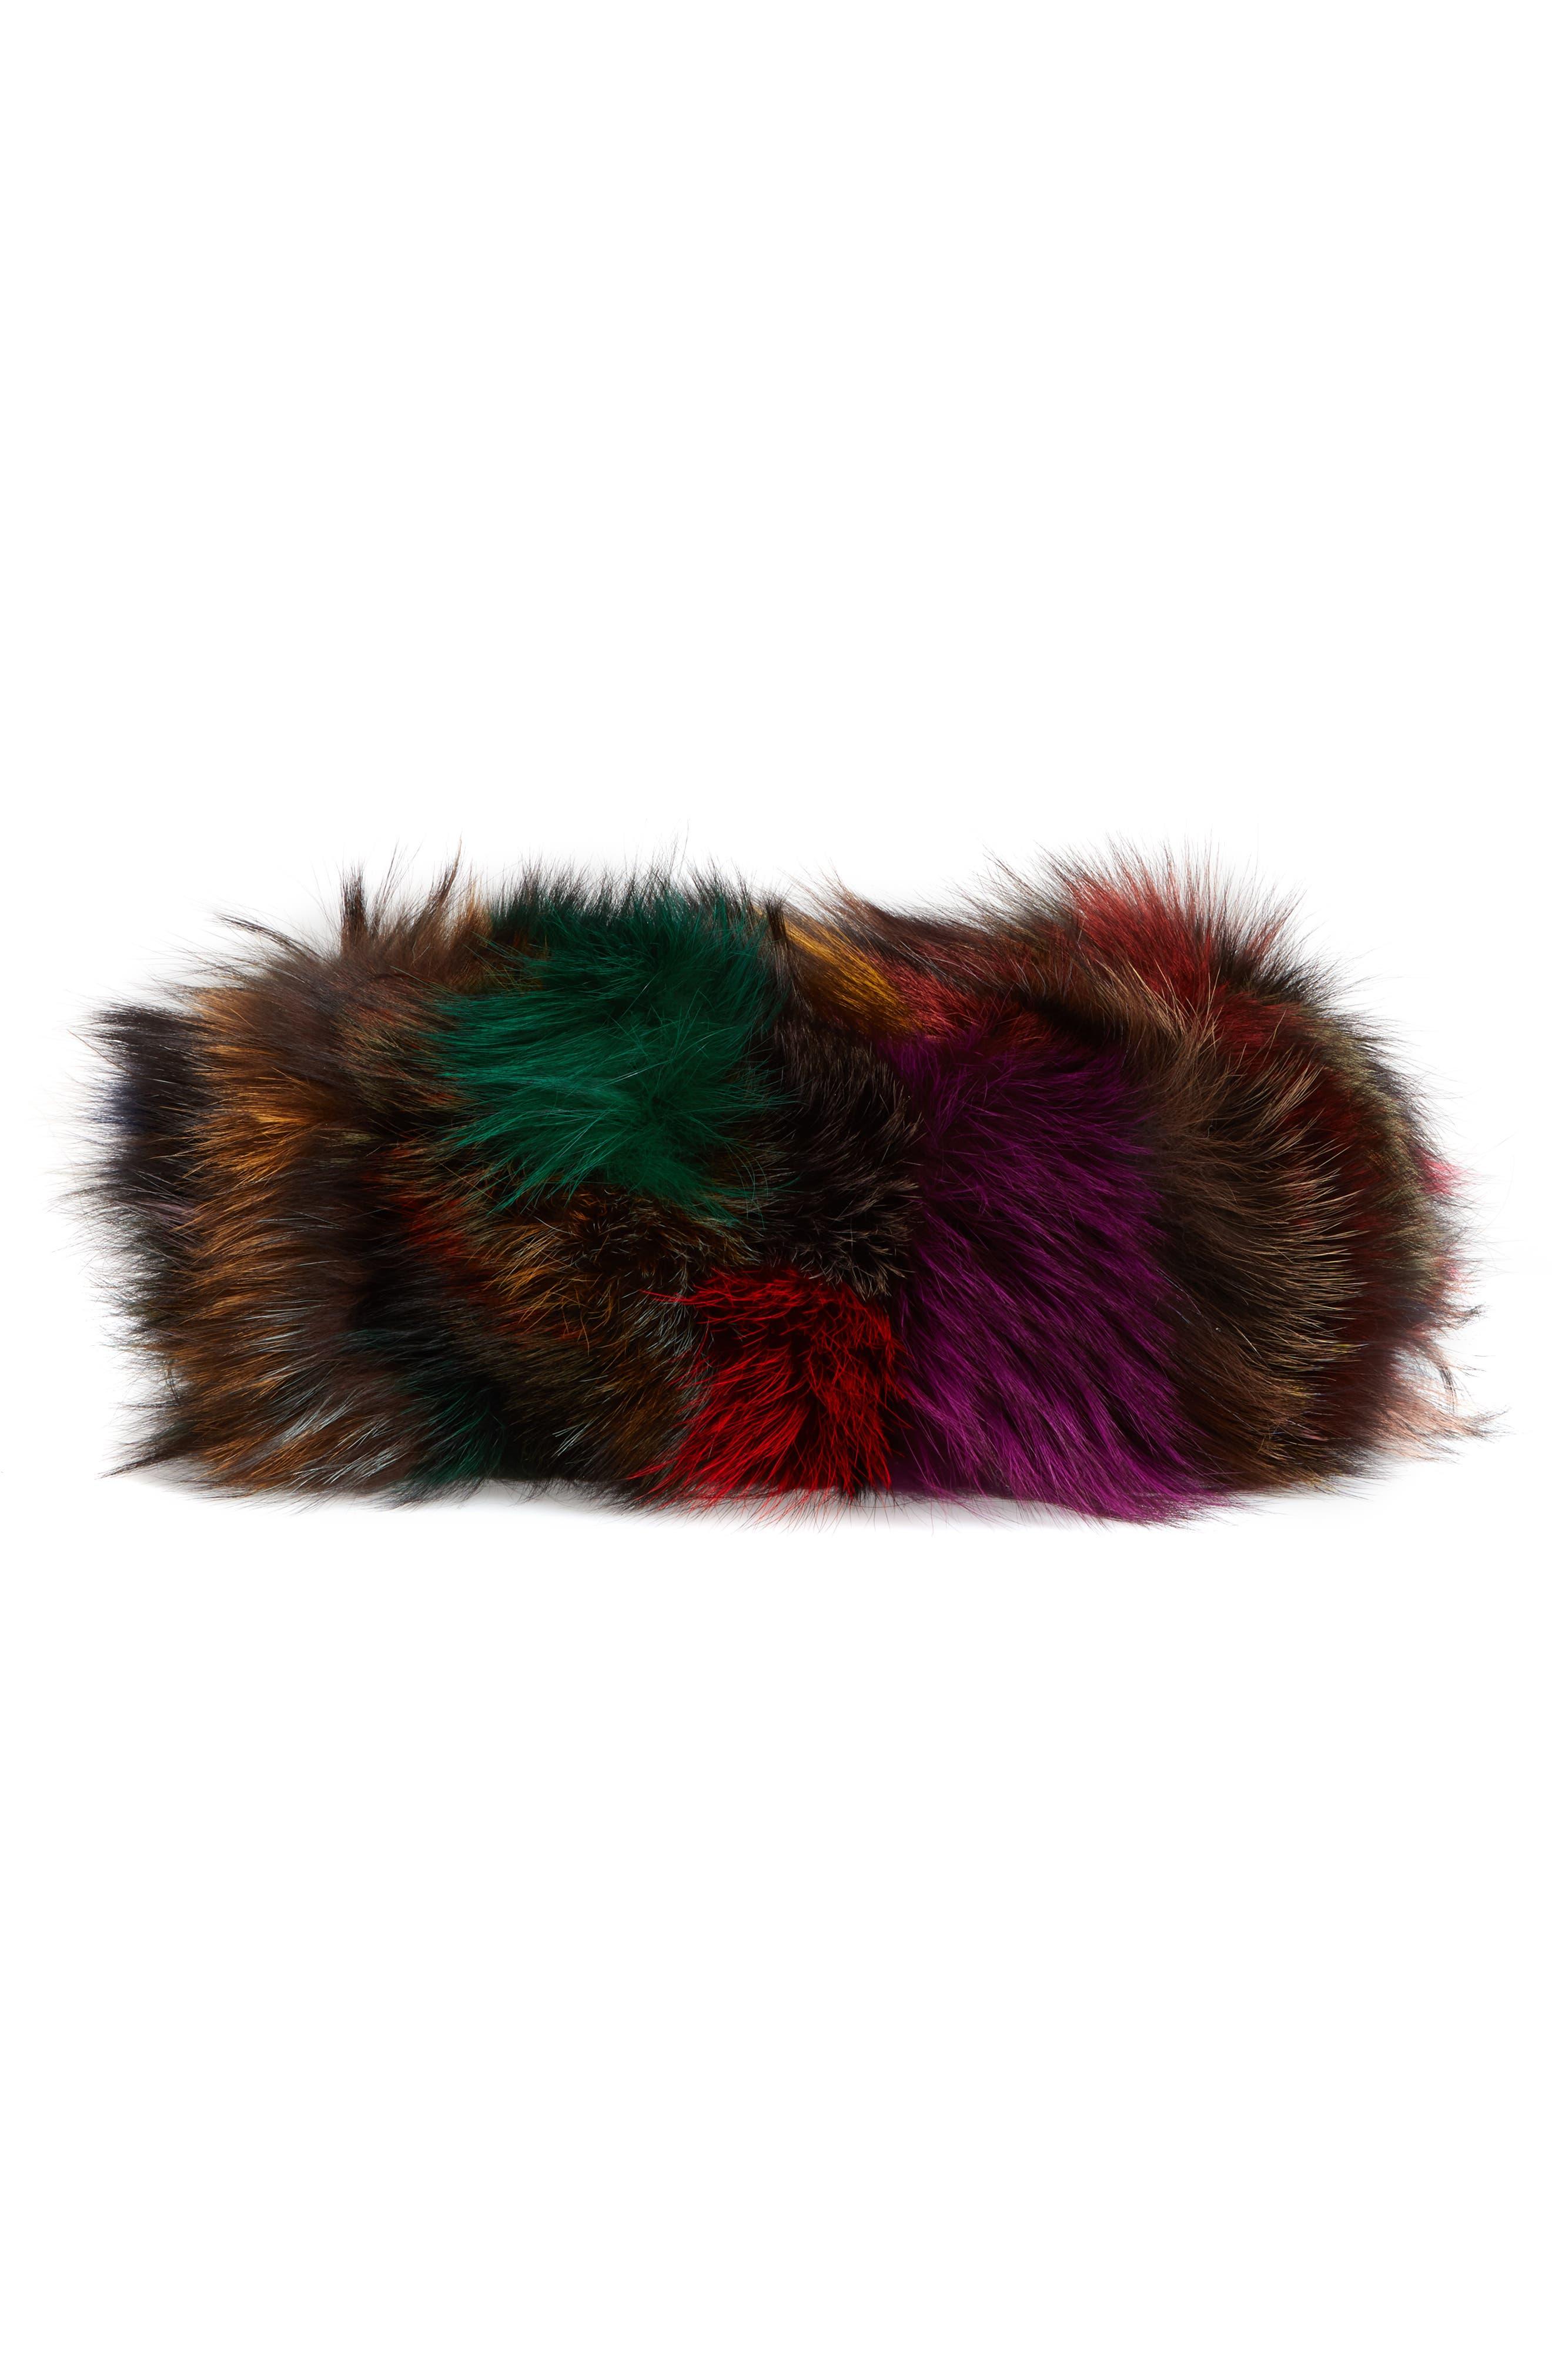 Elmo Genuine Silver Fox Fur Shoulder Bag,                             Alternate thumbnail 7, color,                             BLUE MULTI